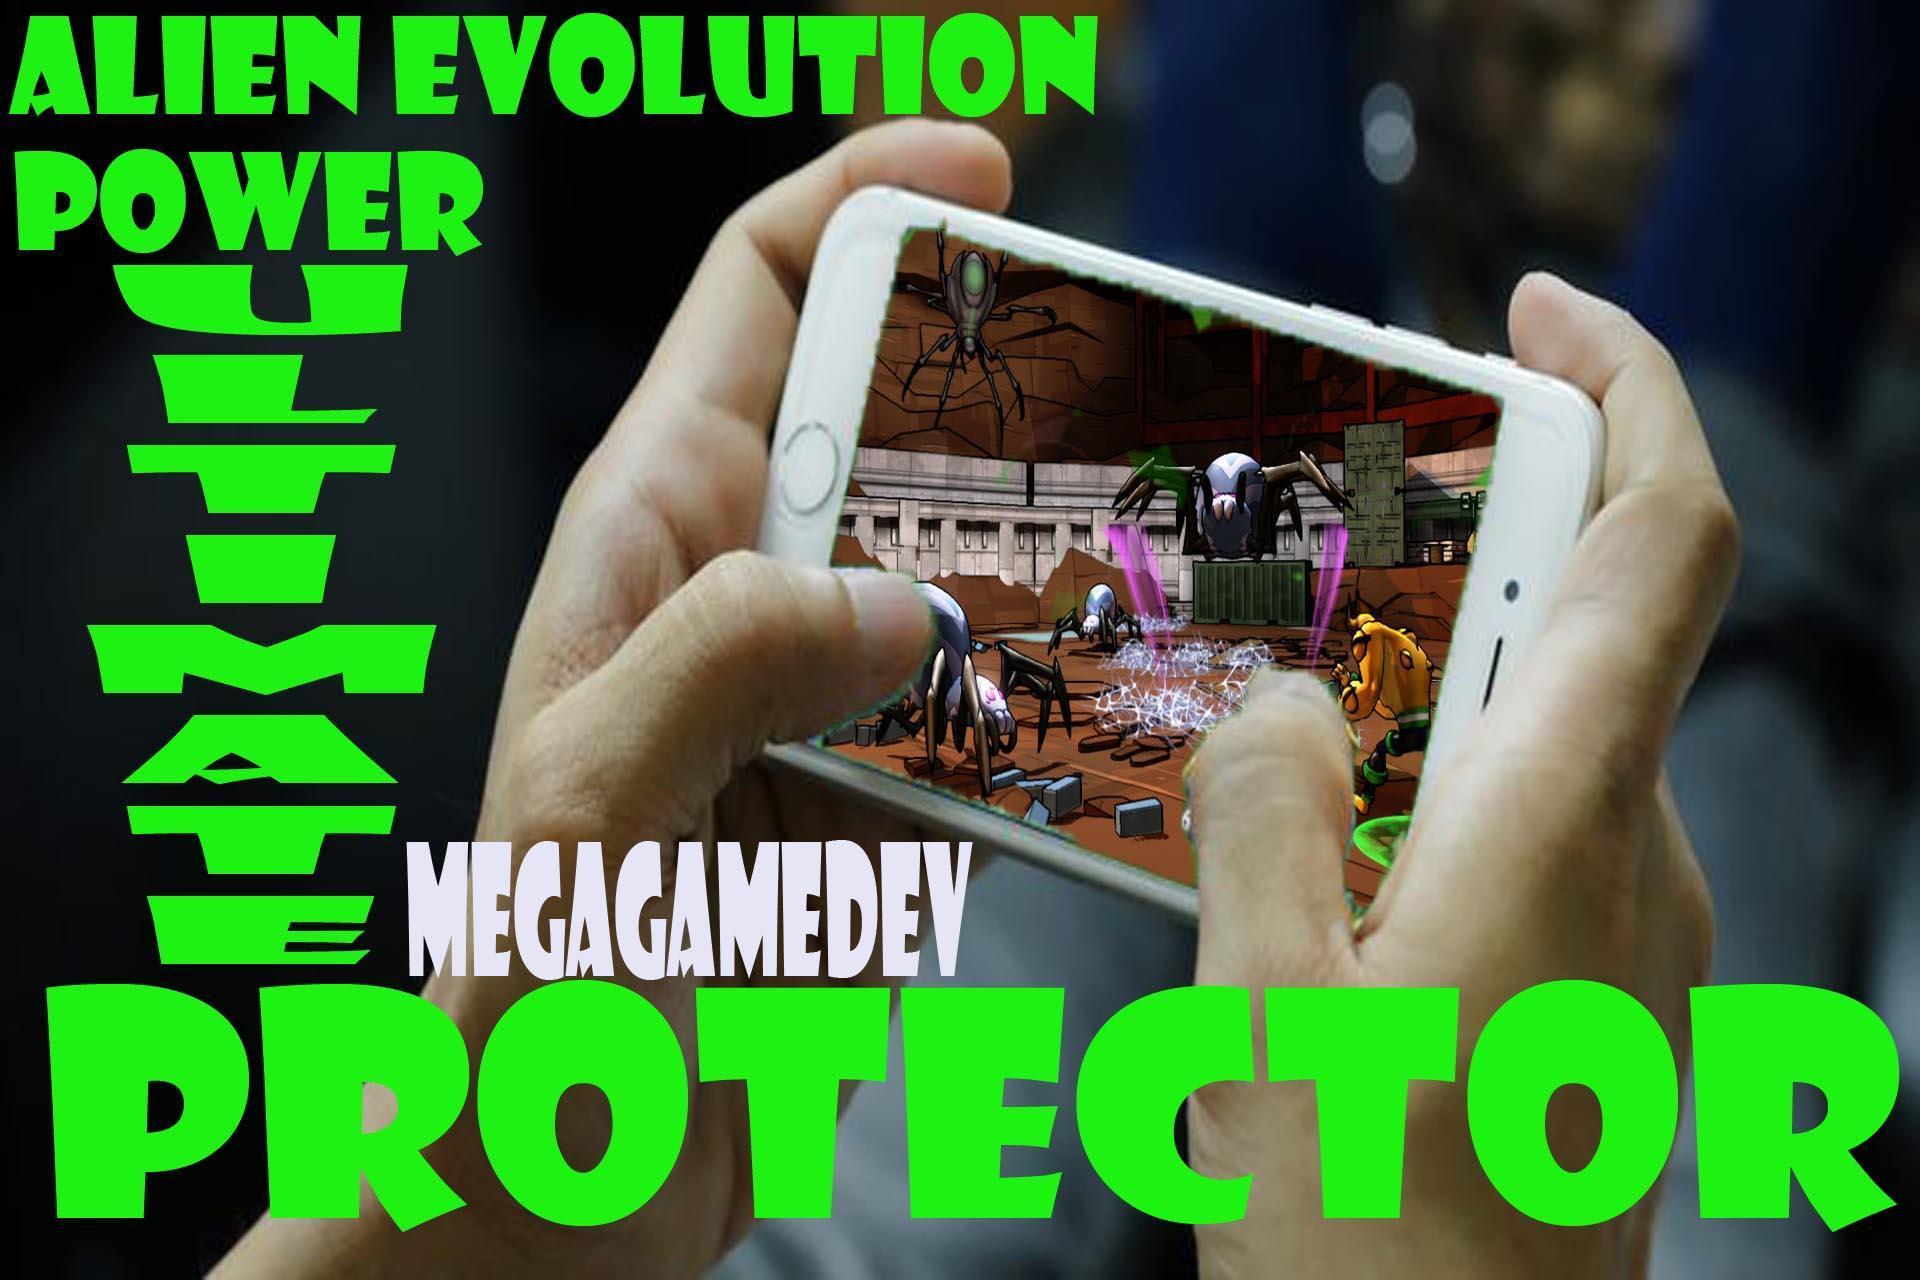 Alien Evolution : Power Ultimate 10 Protector 4.c Screenshot 1